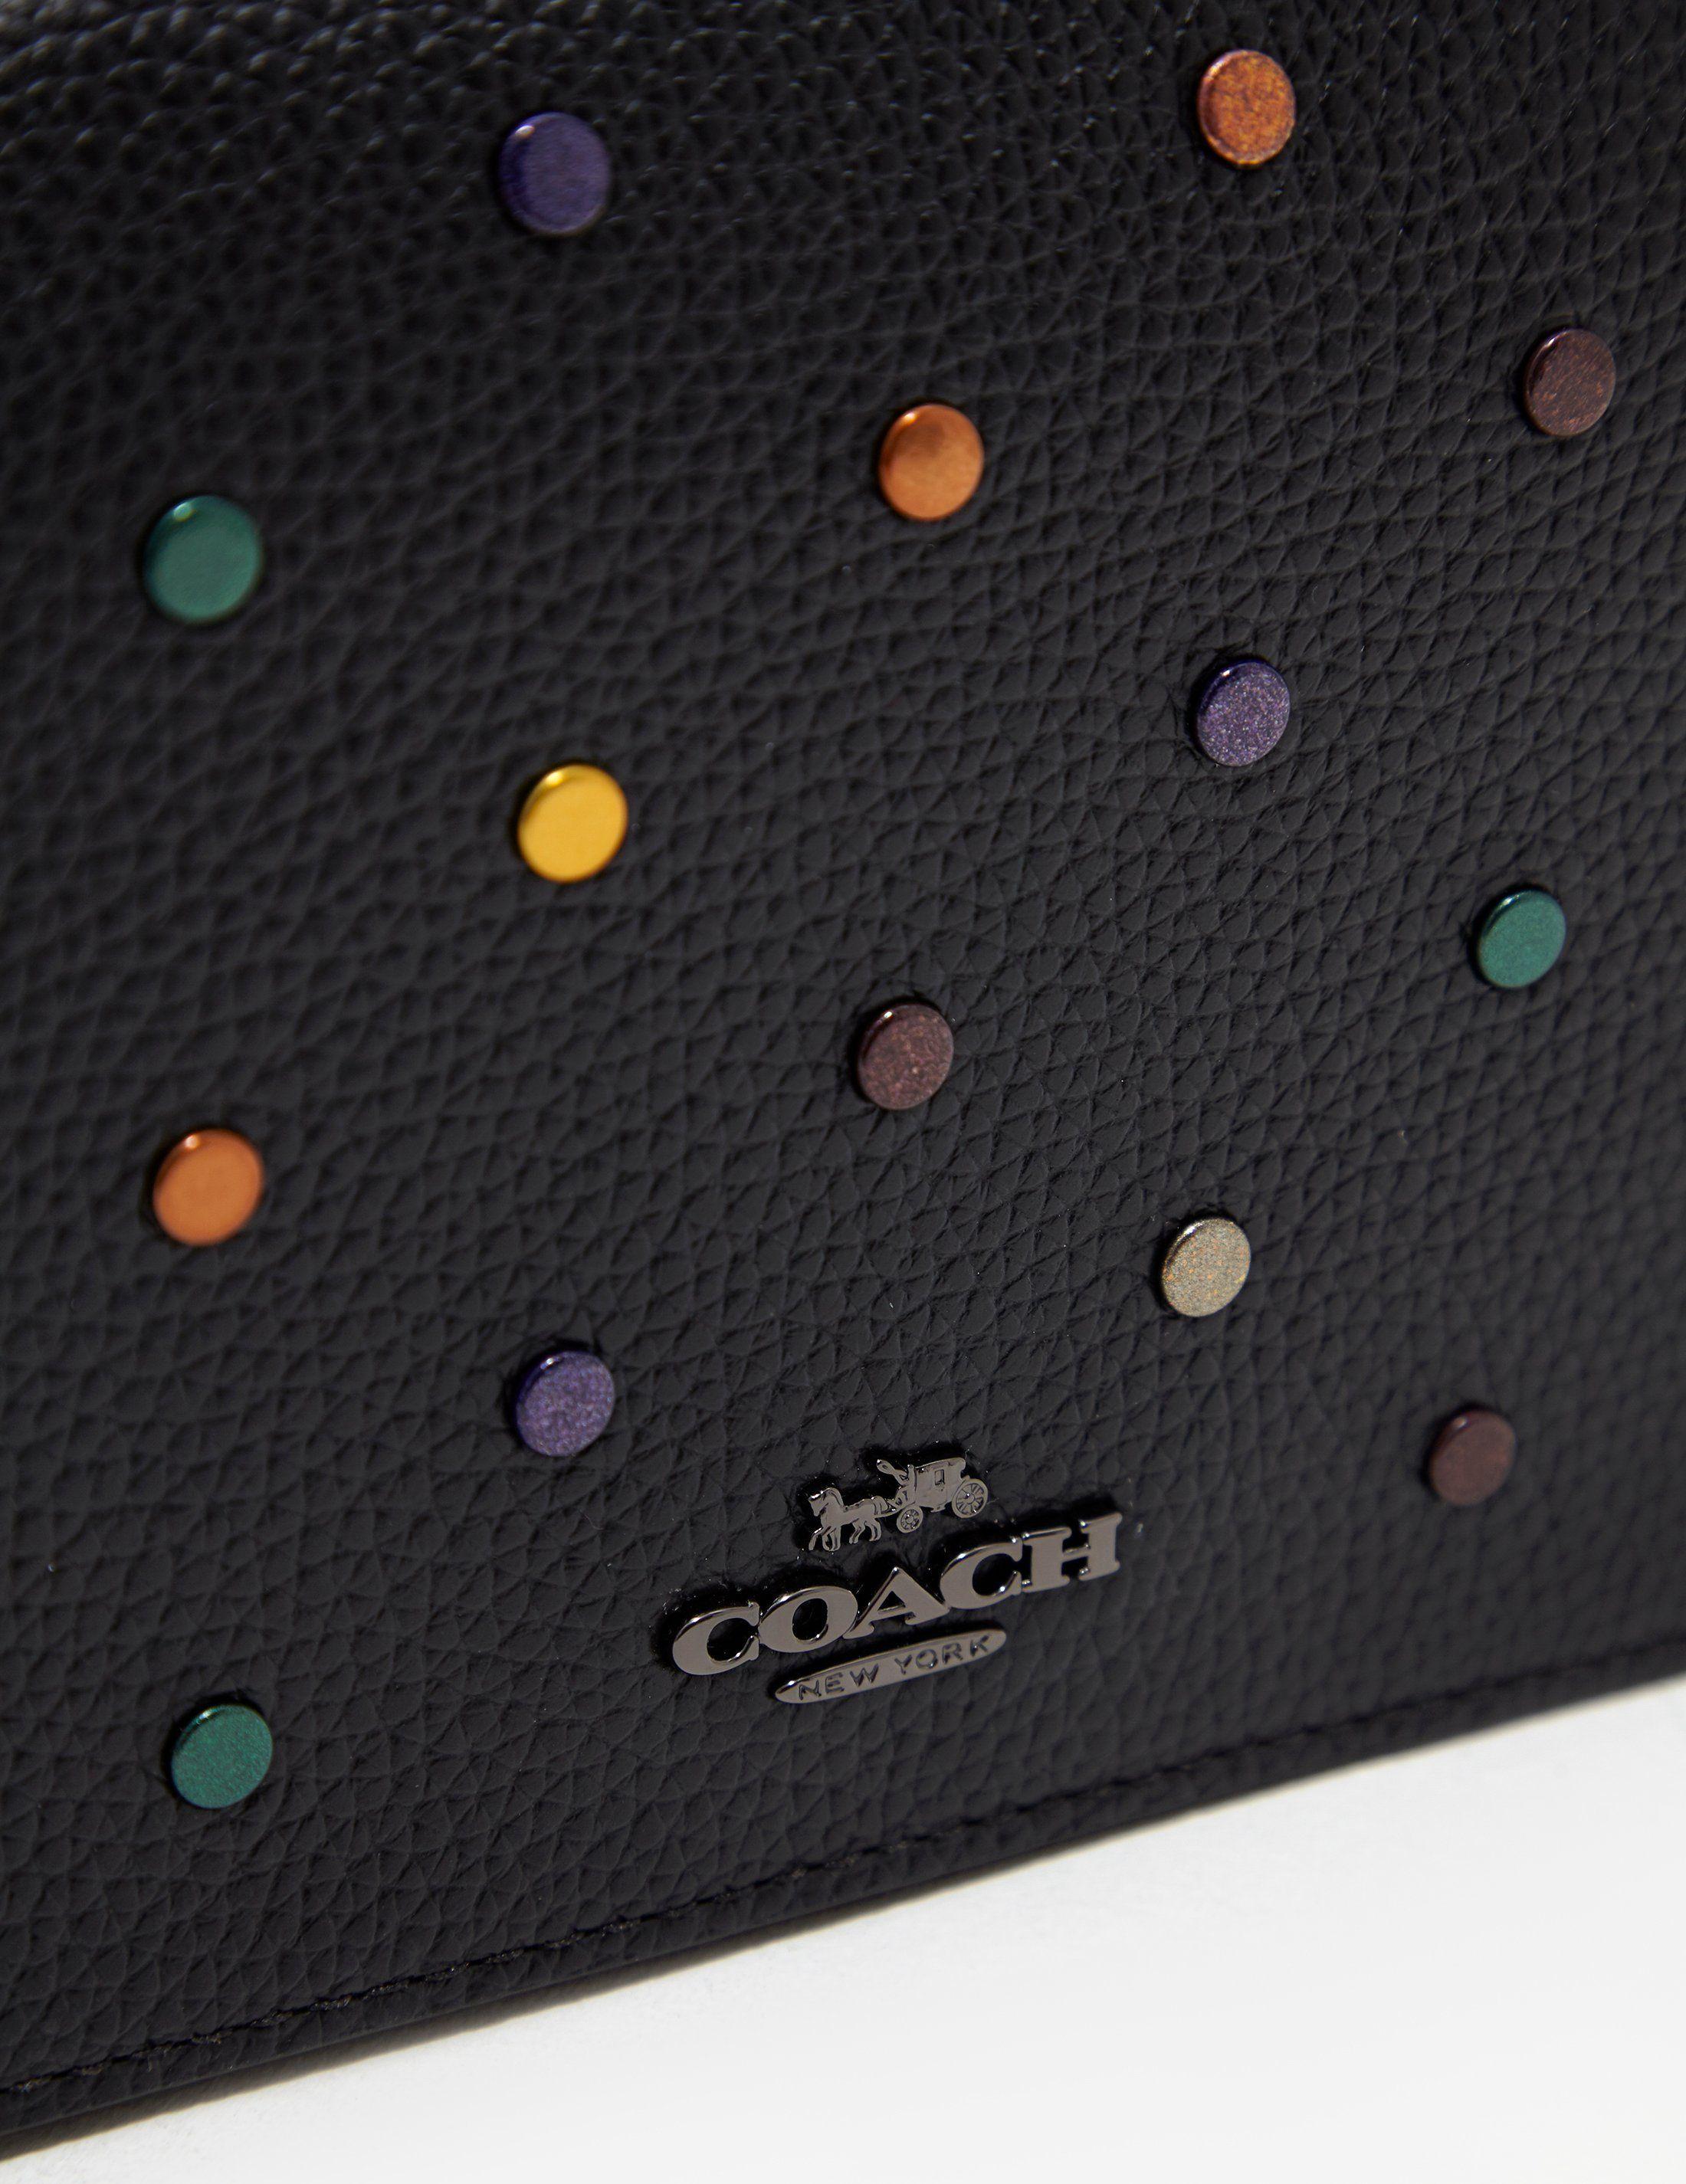 COACH Rivet Clutch Bag